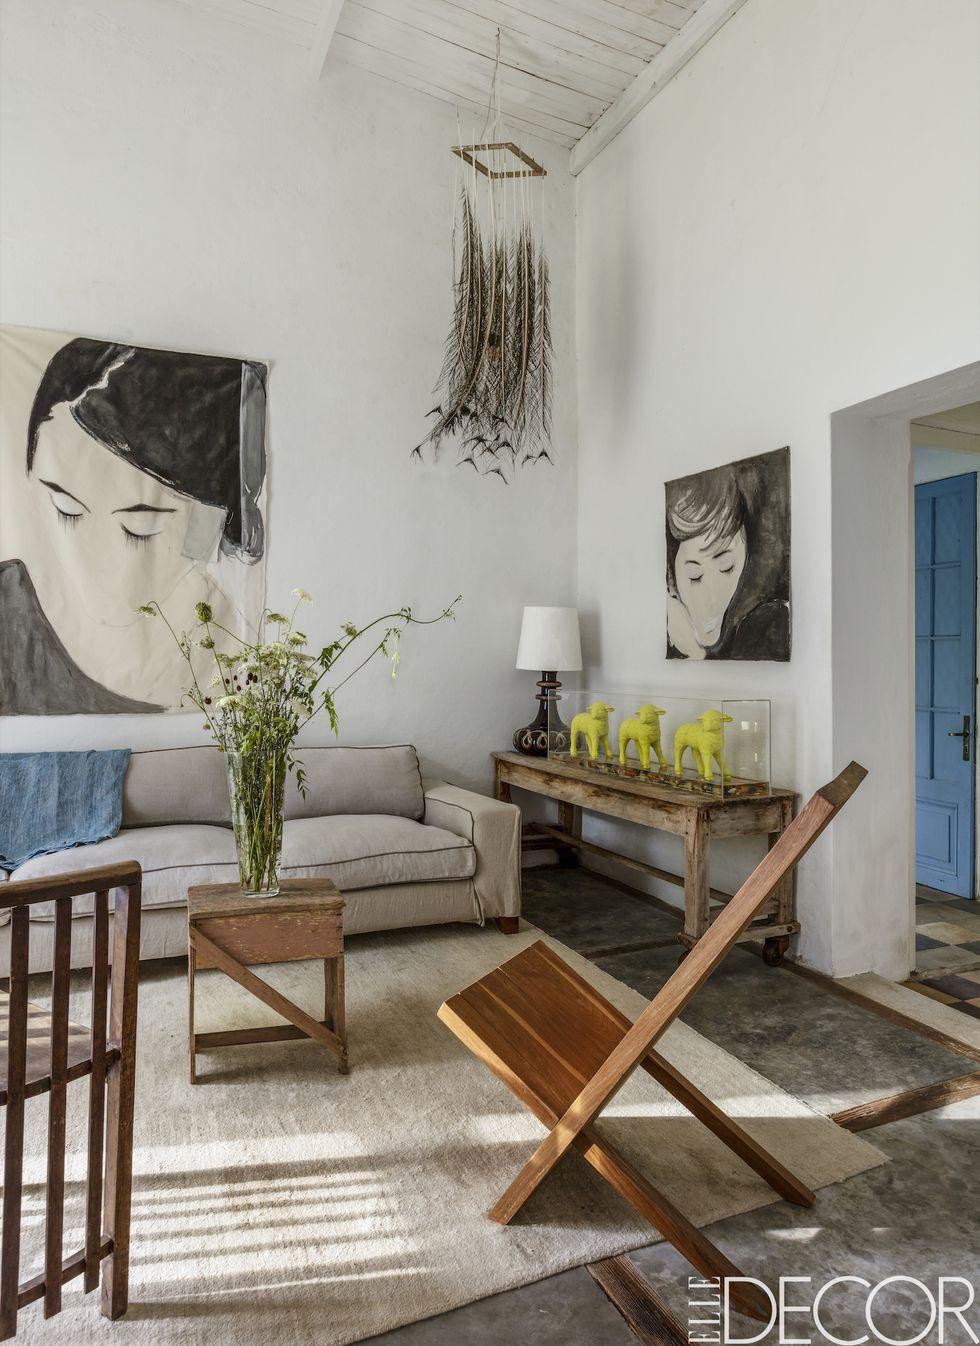 living room decoration ideas 45 best living room ideas - beautiful living room decor YTRWFVM